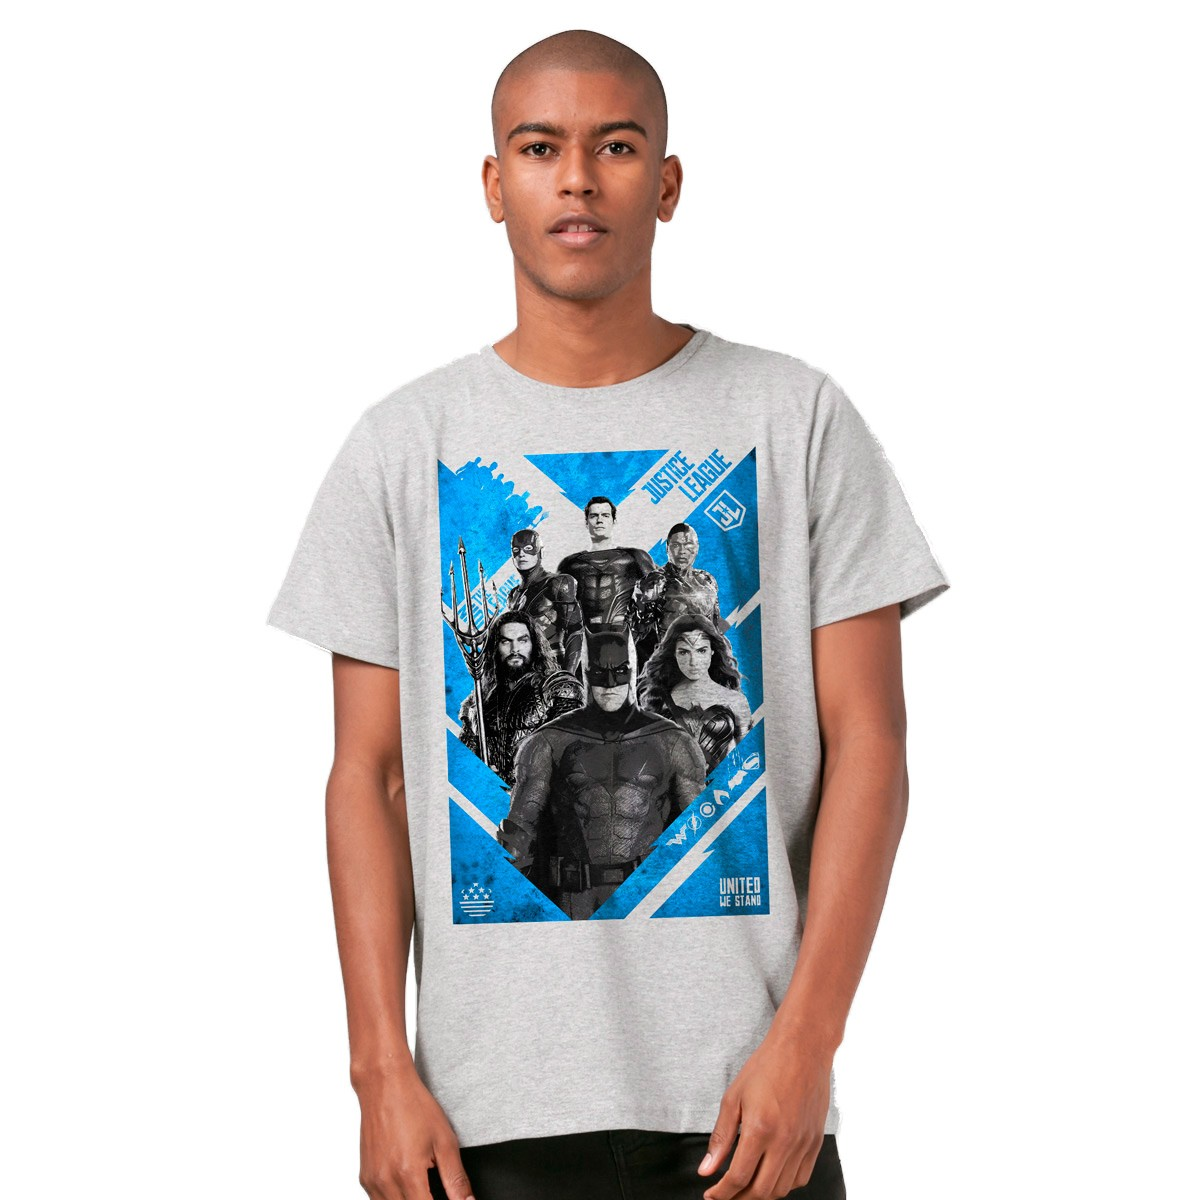 Camiseta Masculina Liga da Justiça United to Stand